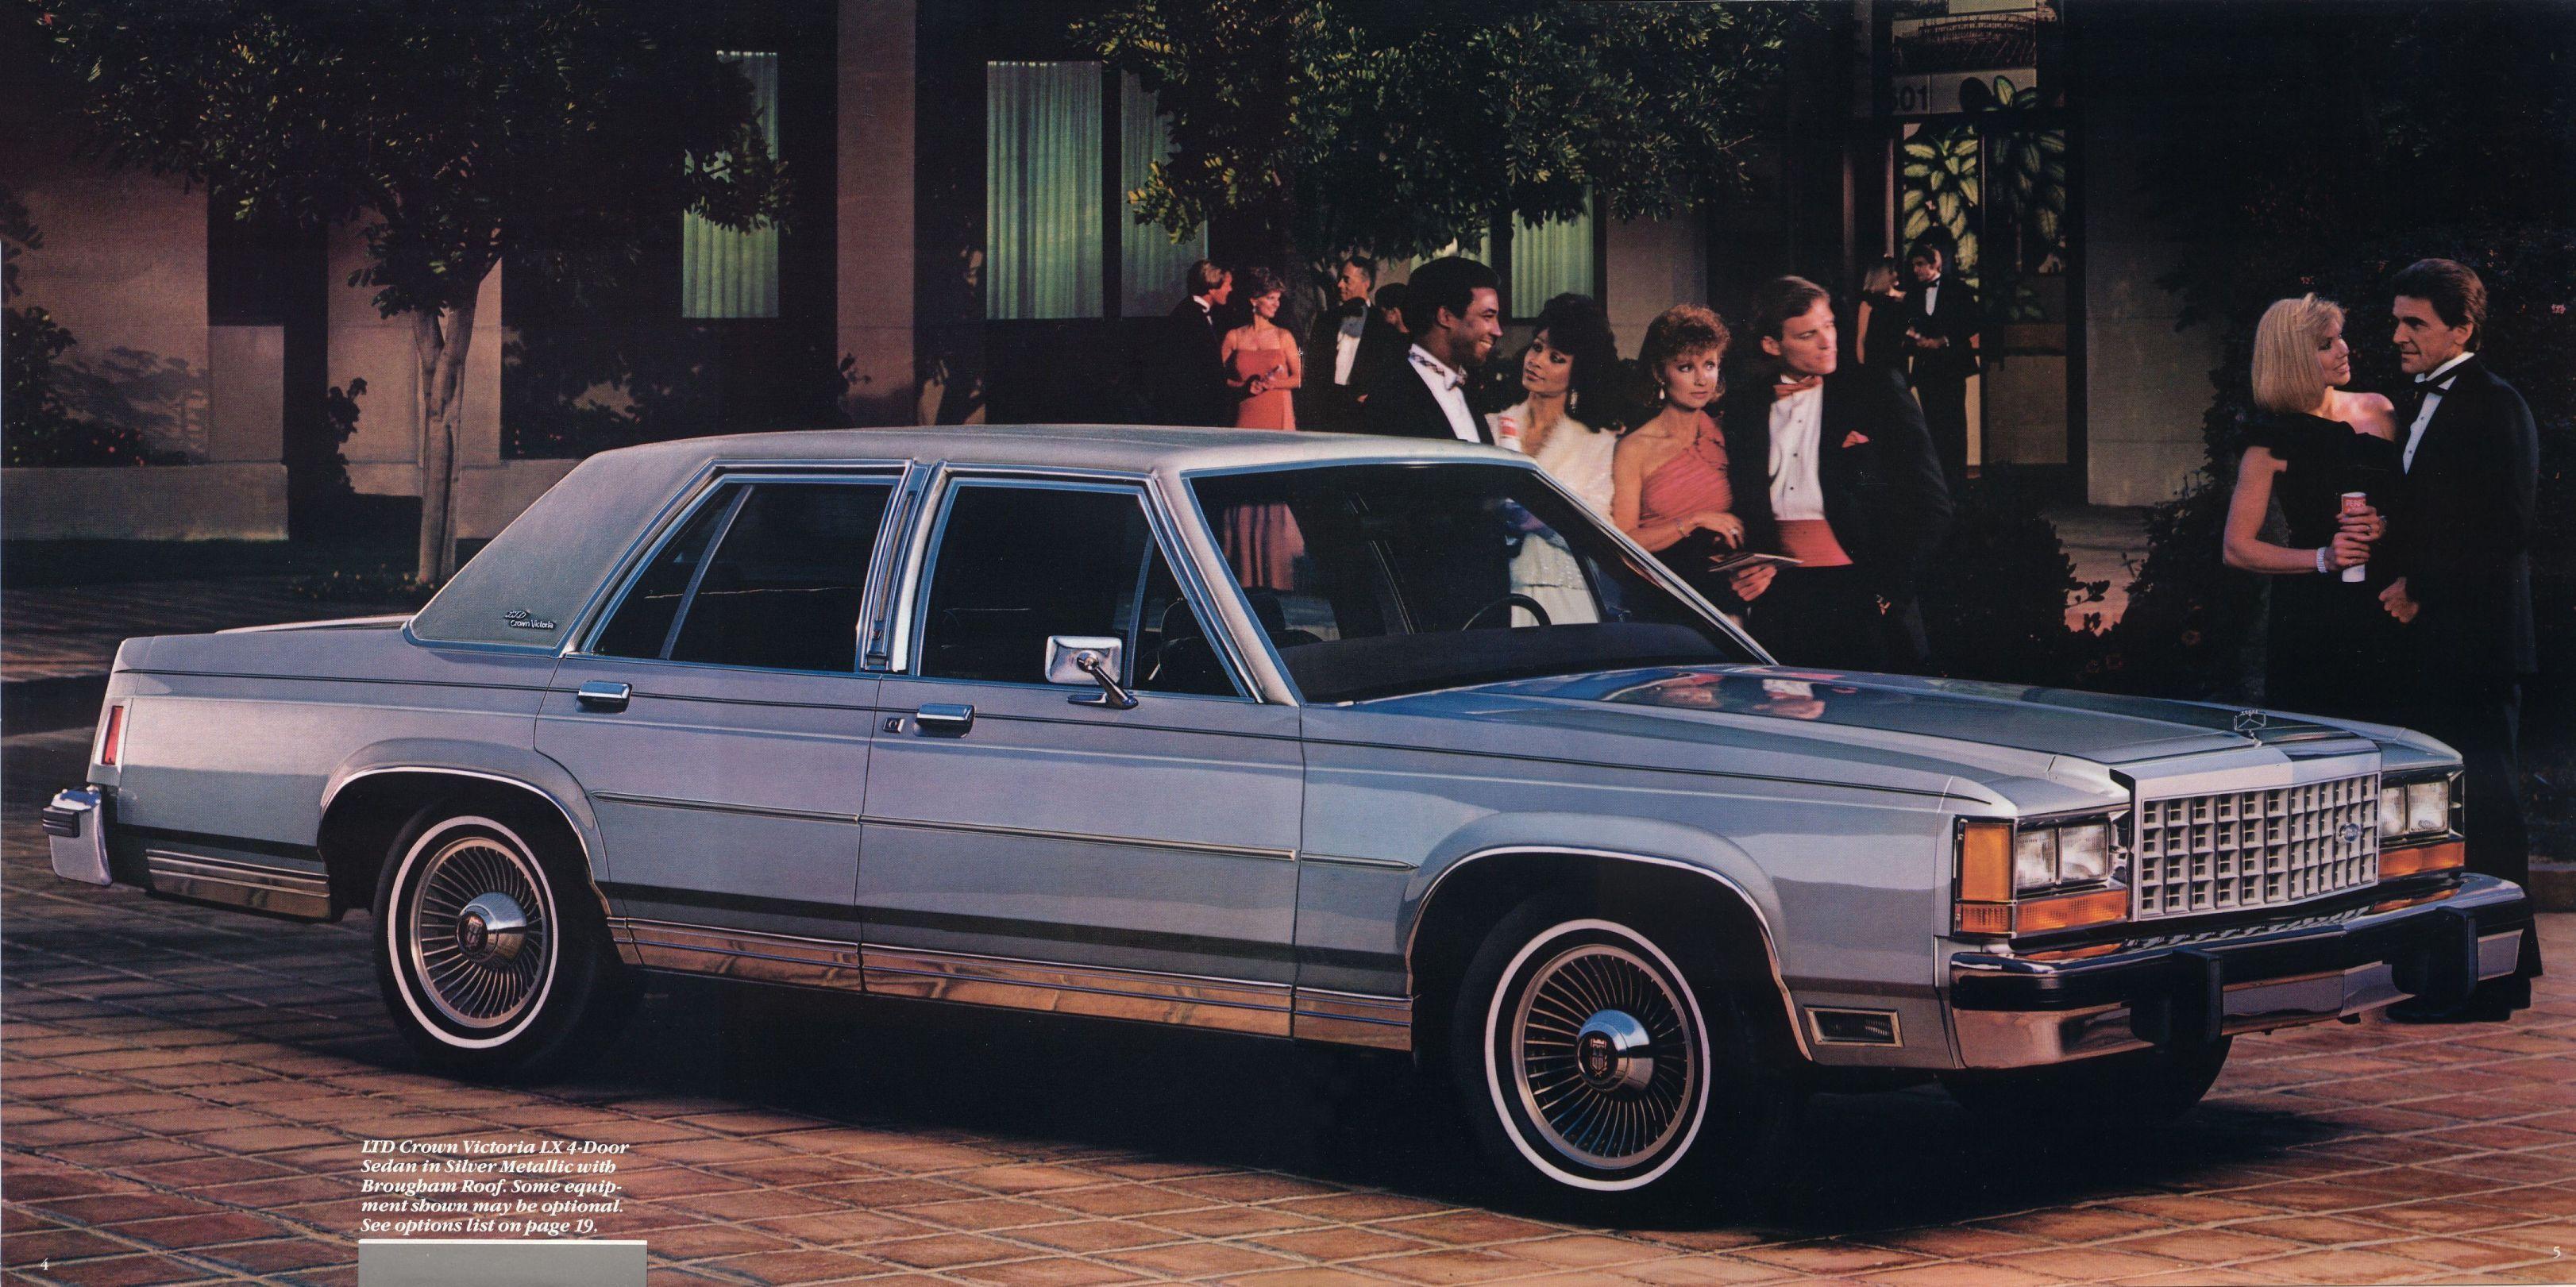 Ford Ltd Crown Victoria Lx Door Sedan When America Needs